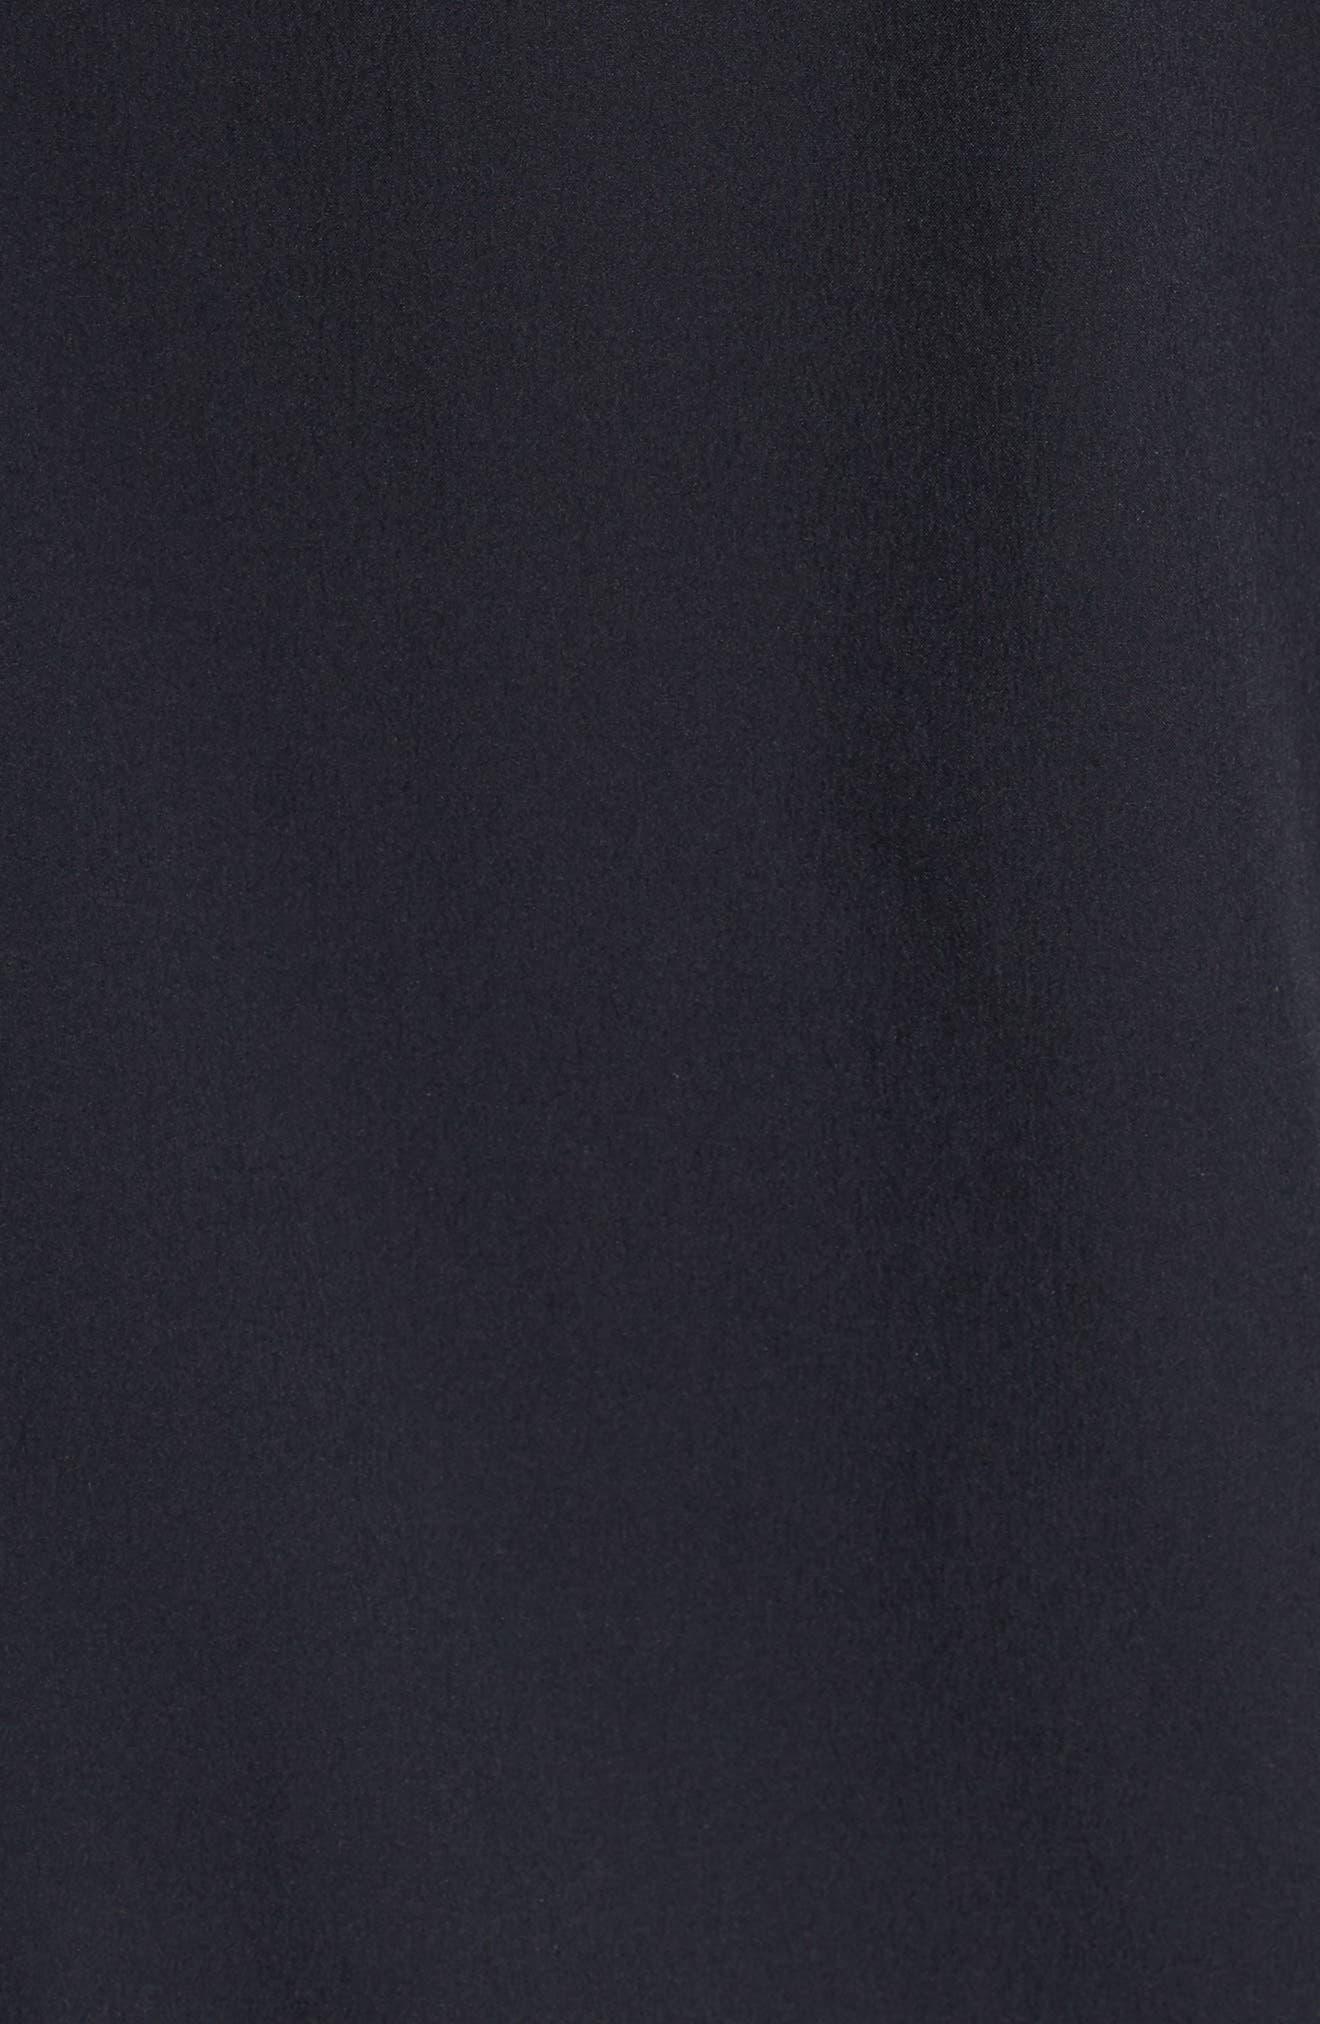 Baseline Hooded Jacket,                             Alternate thumbnail 7, color,                             BLACK